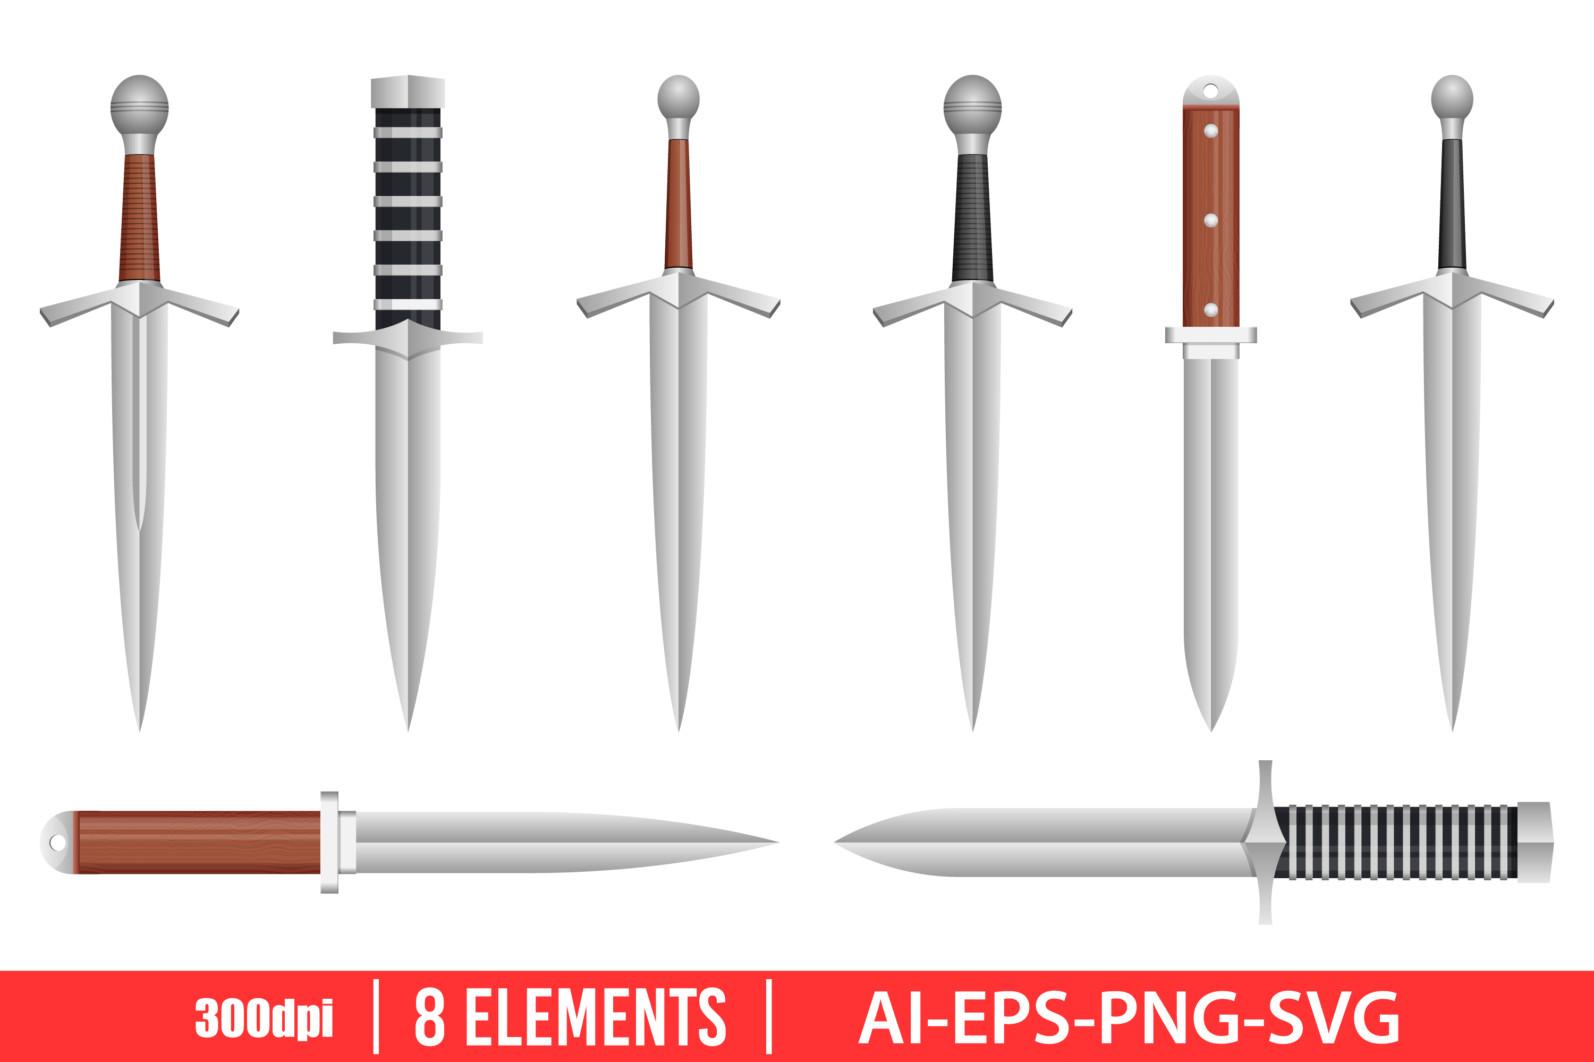 Realistic dagger clipart vector design illustration. Dagger set. Vector Clipart Print - DAGGER KNIFE scaled -